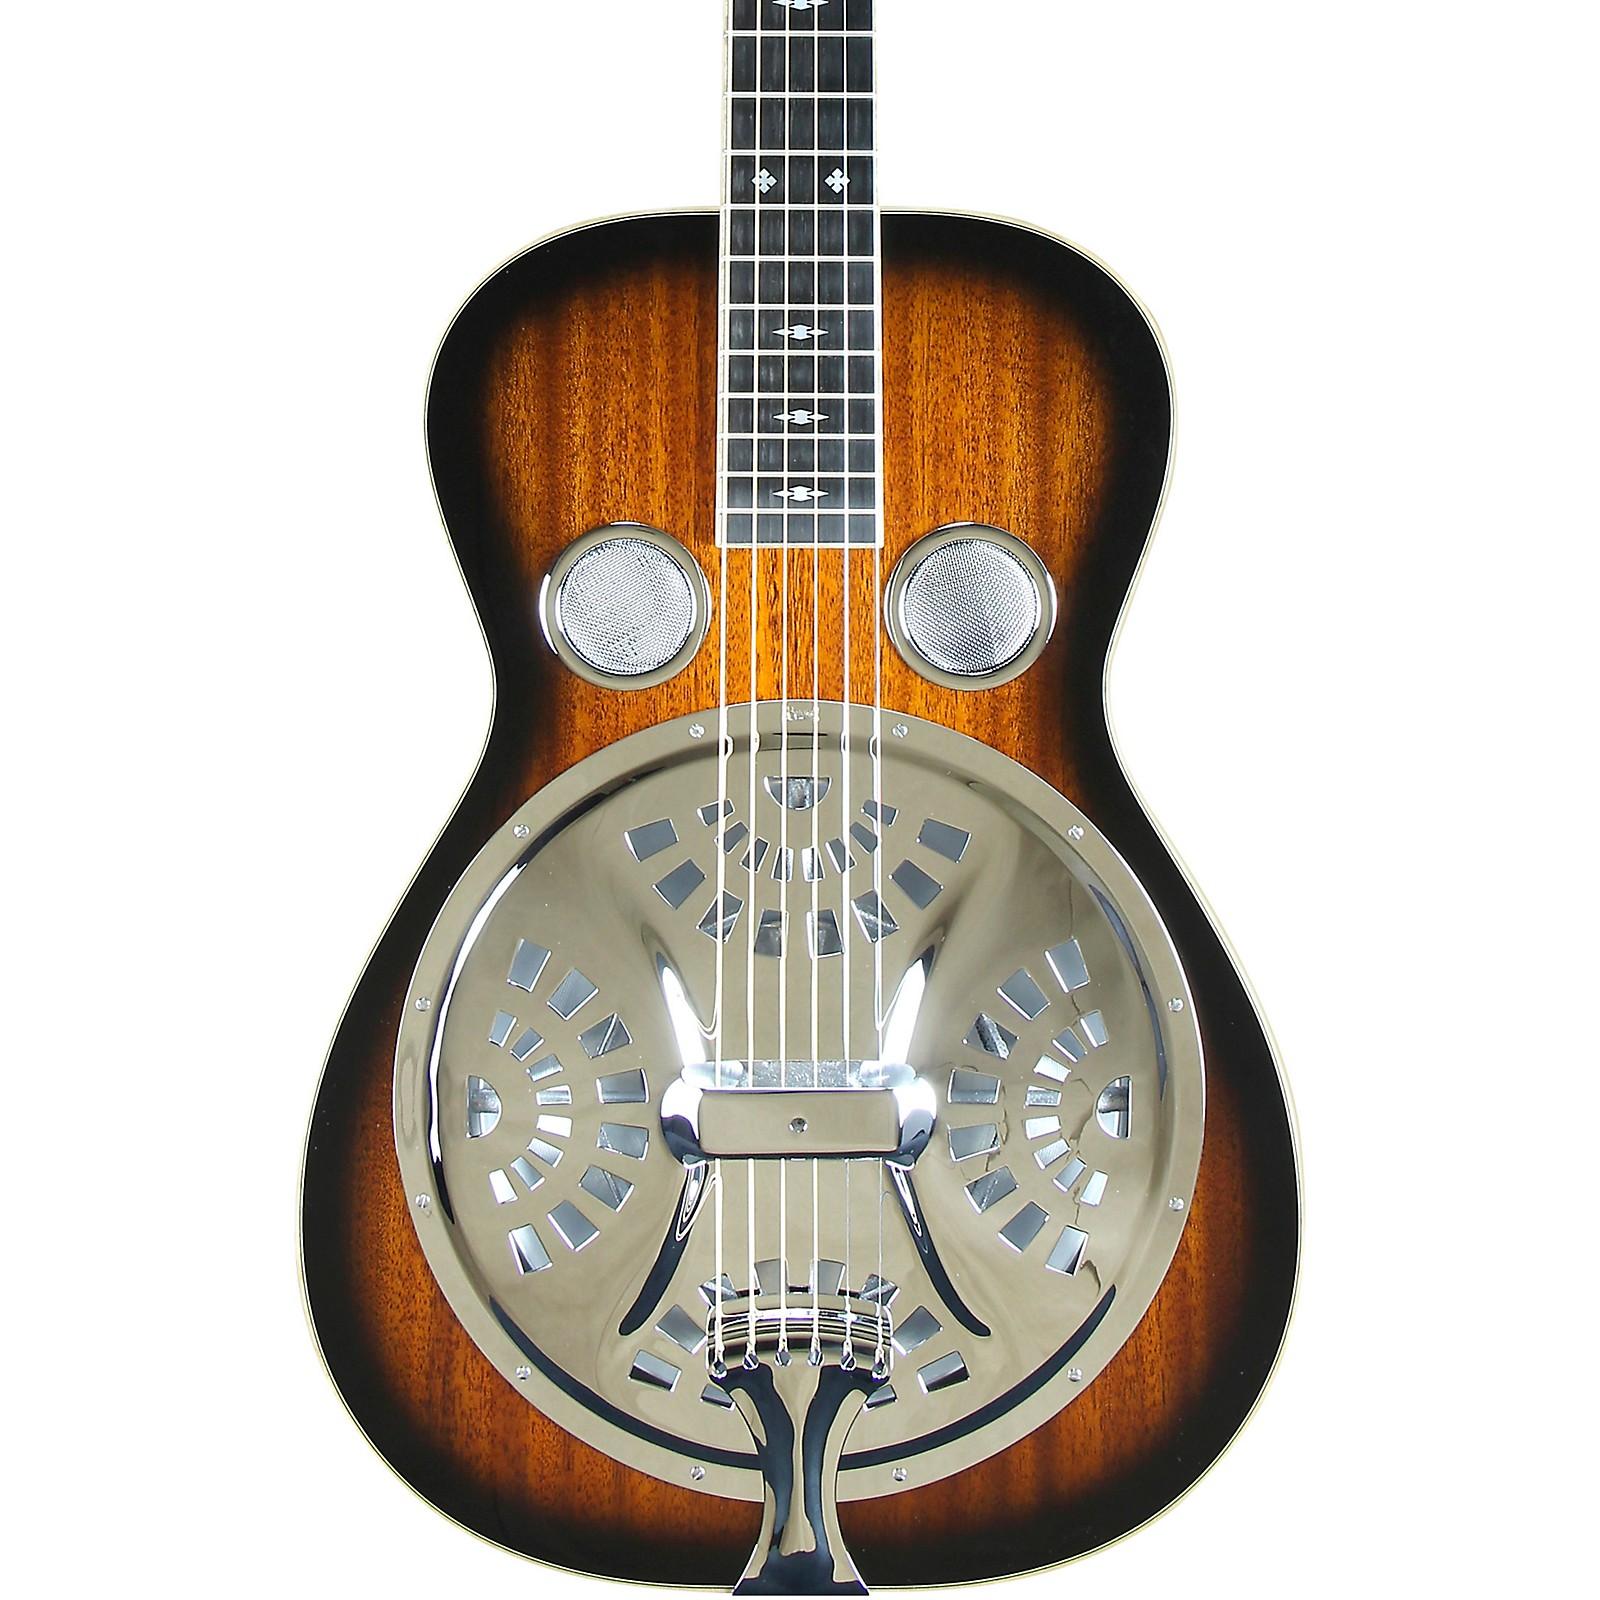 Beard Guitars Mahogany Square Neck Left-Handed Resonator Guitar